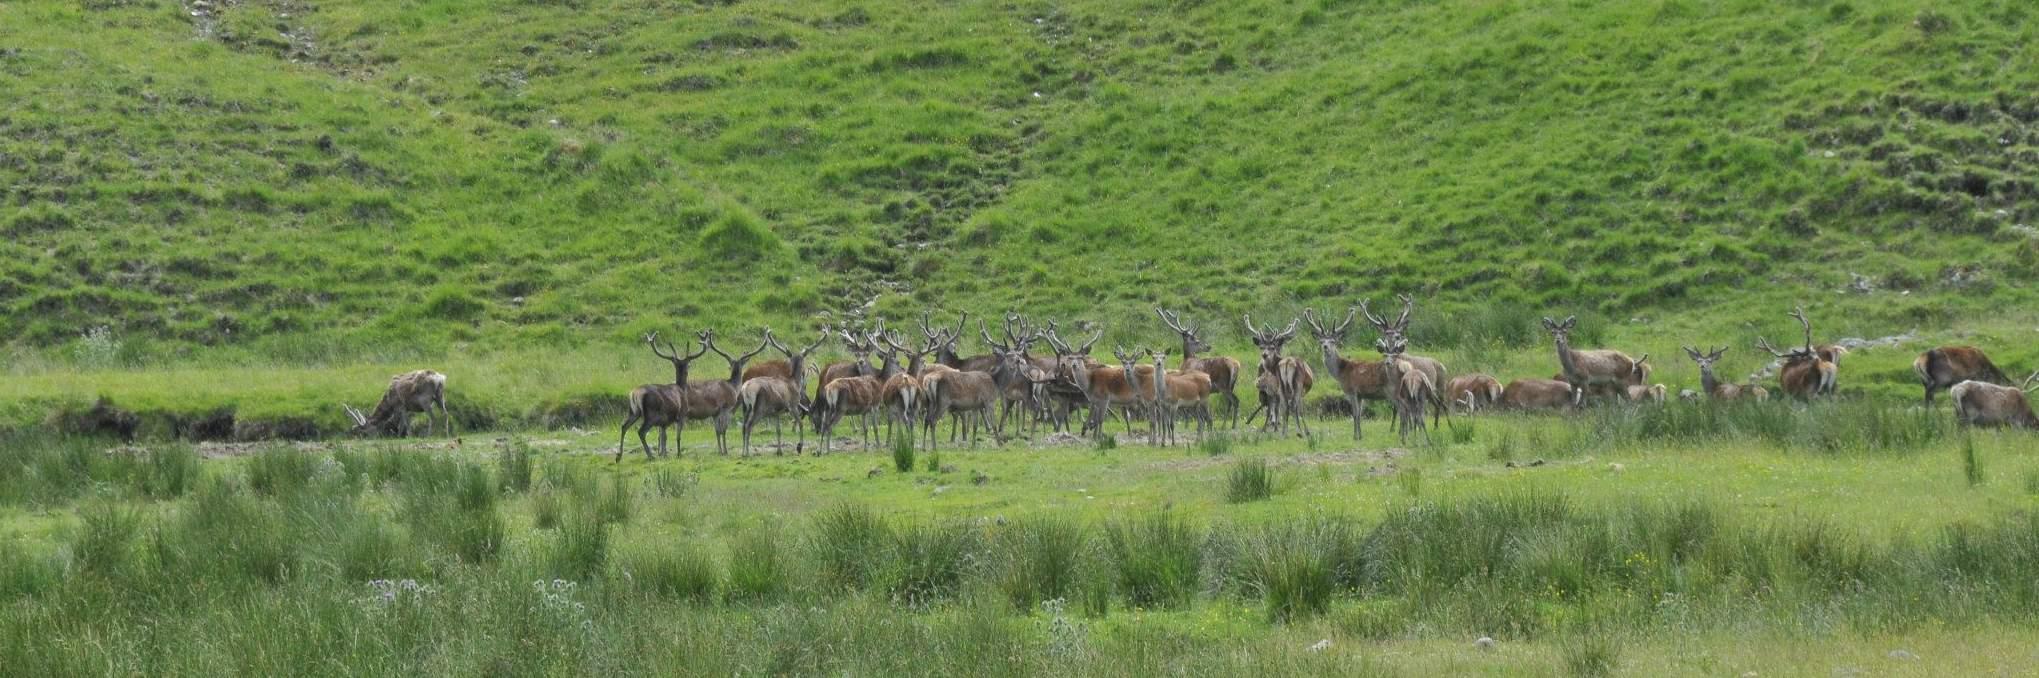 Wildlife in Ayrshire & Arran